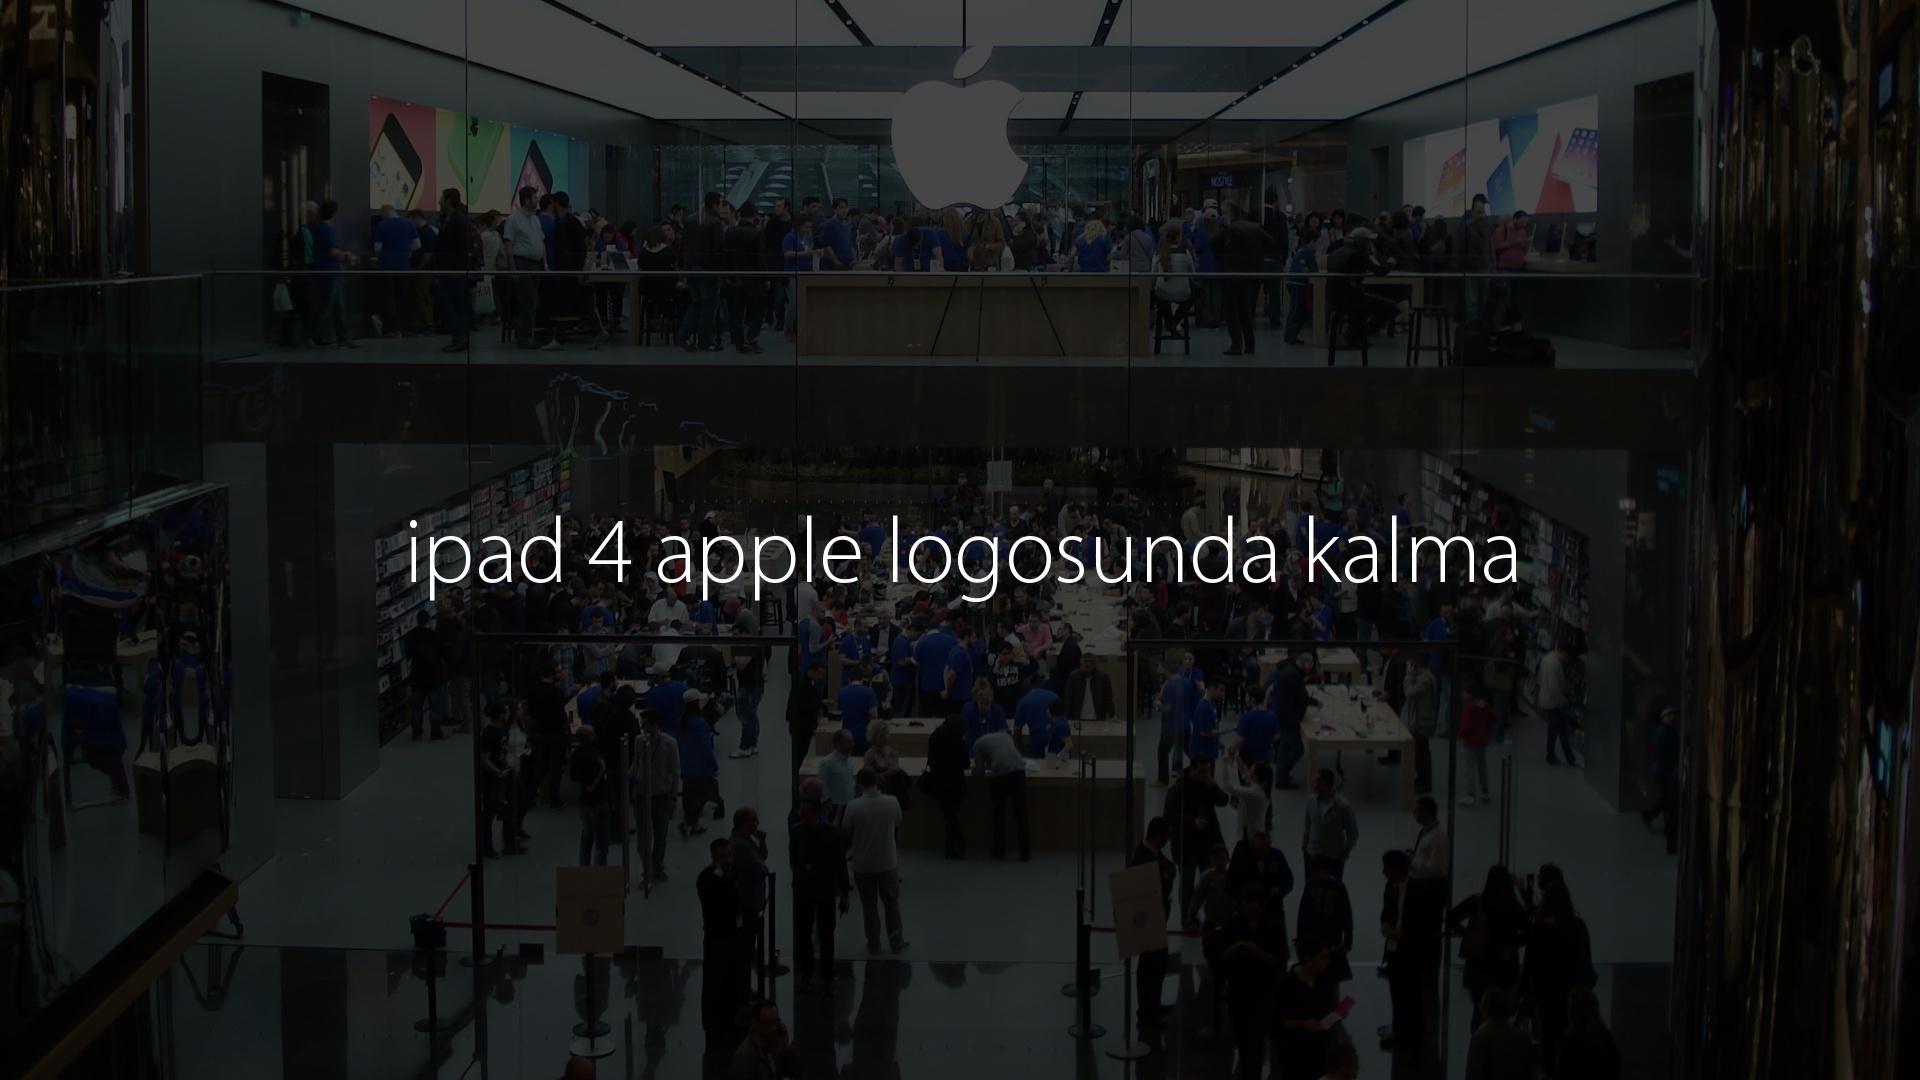 ipad 4 apple logosunda kalma